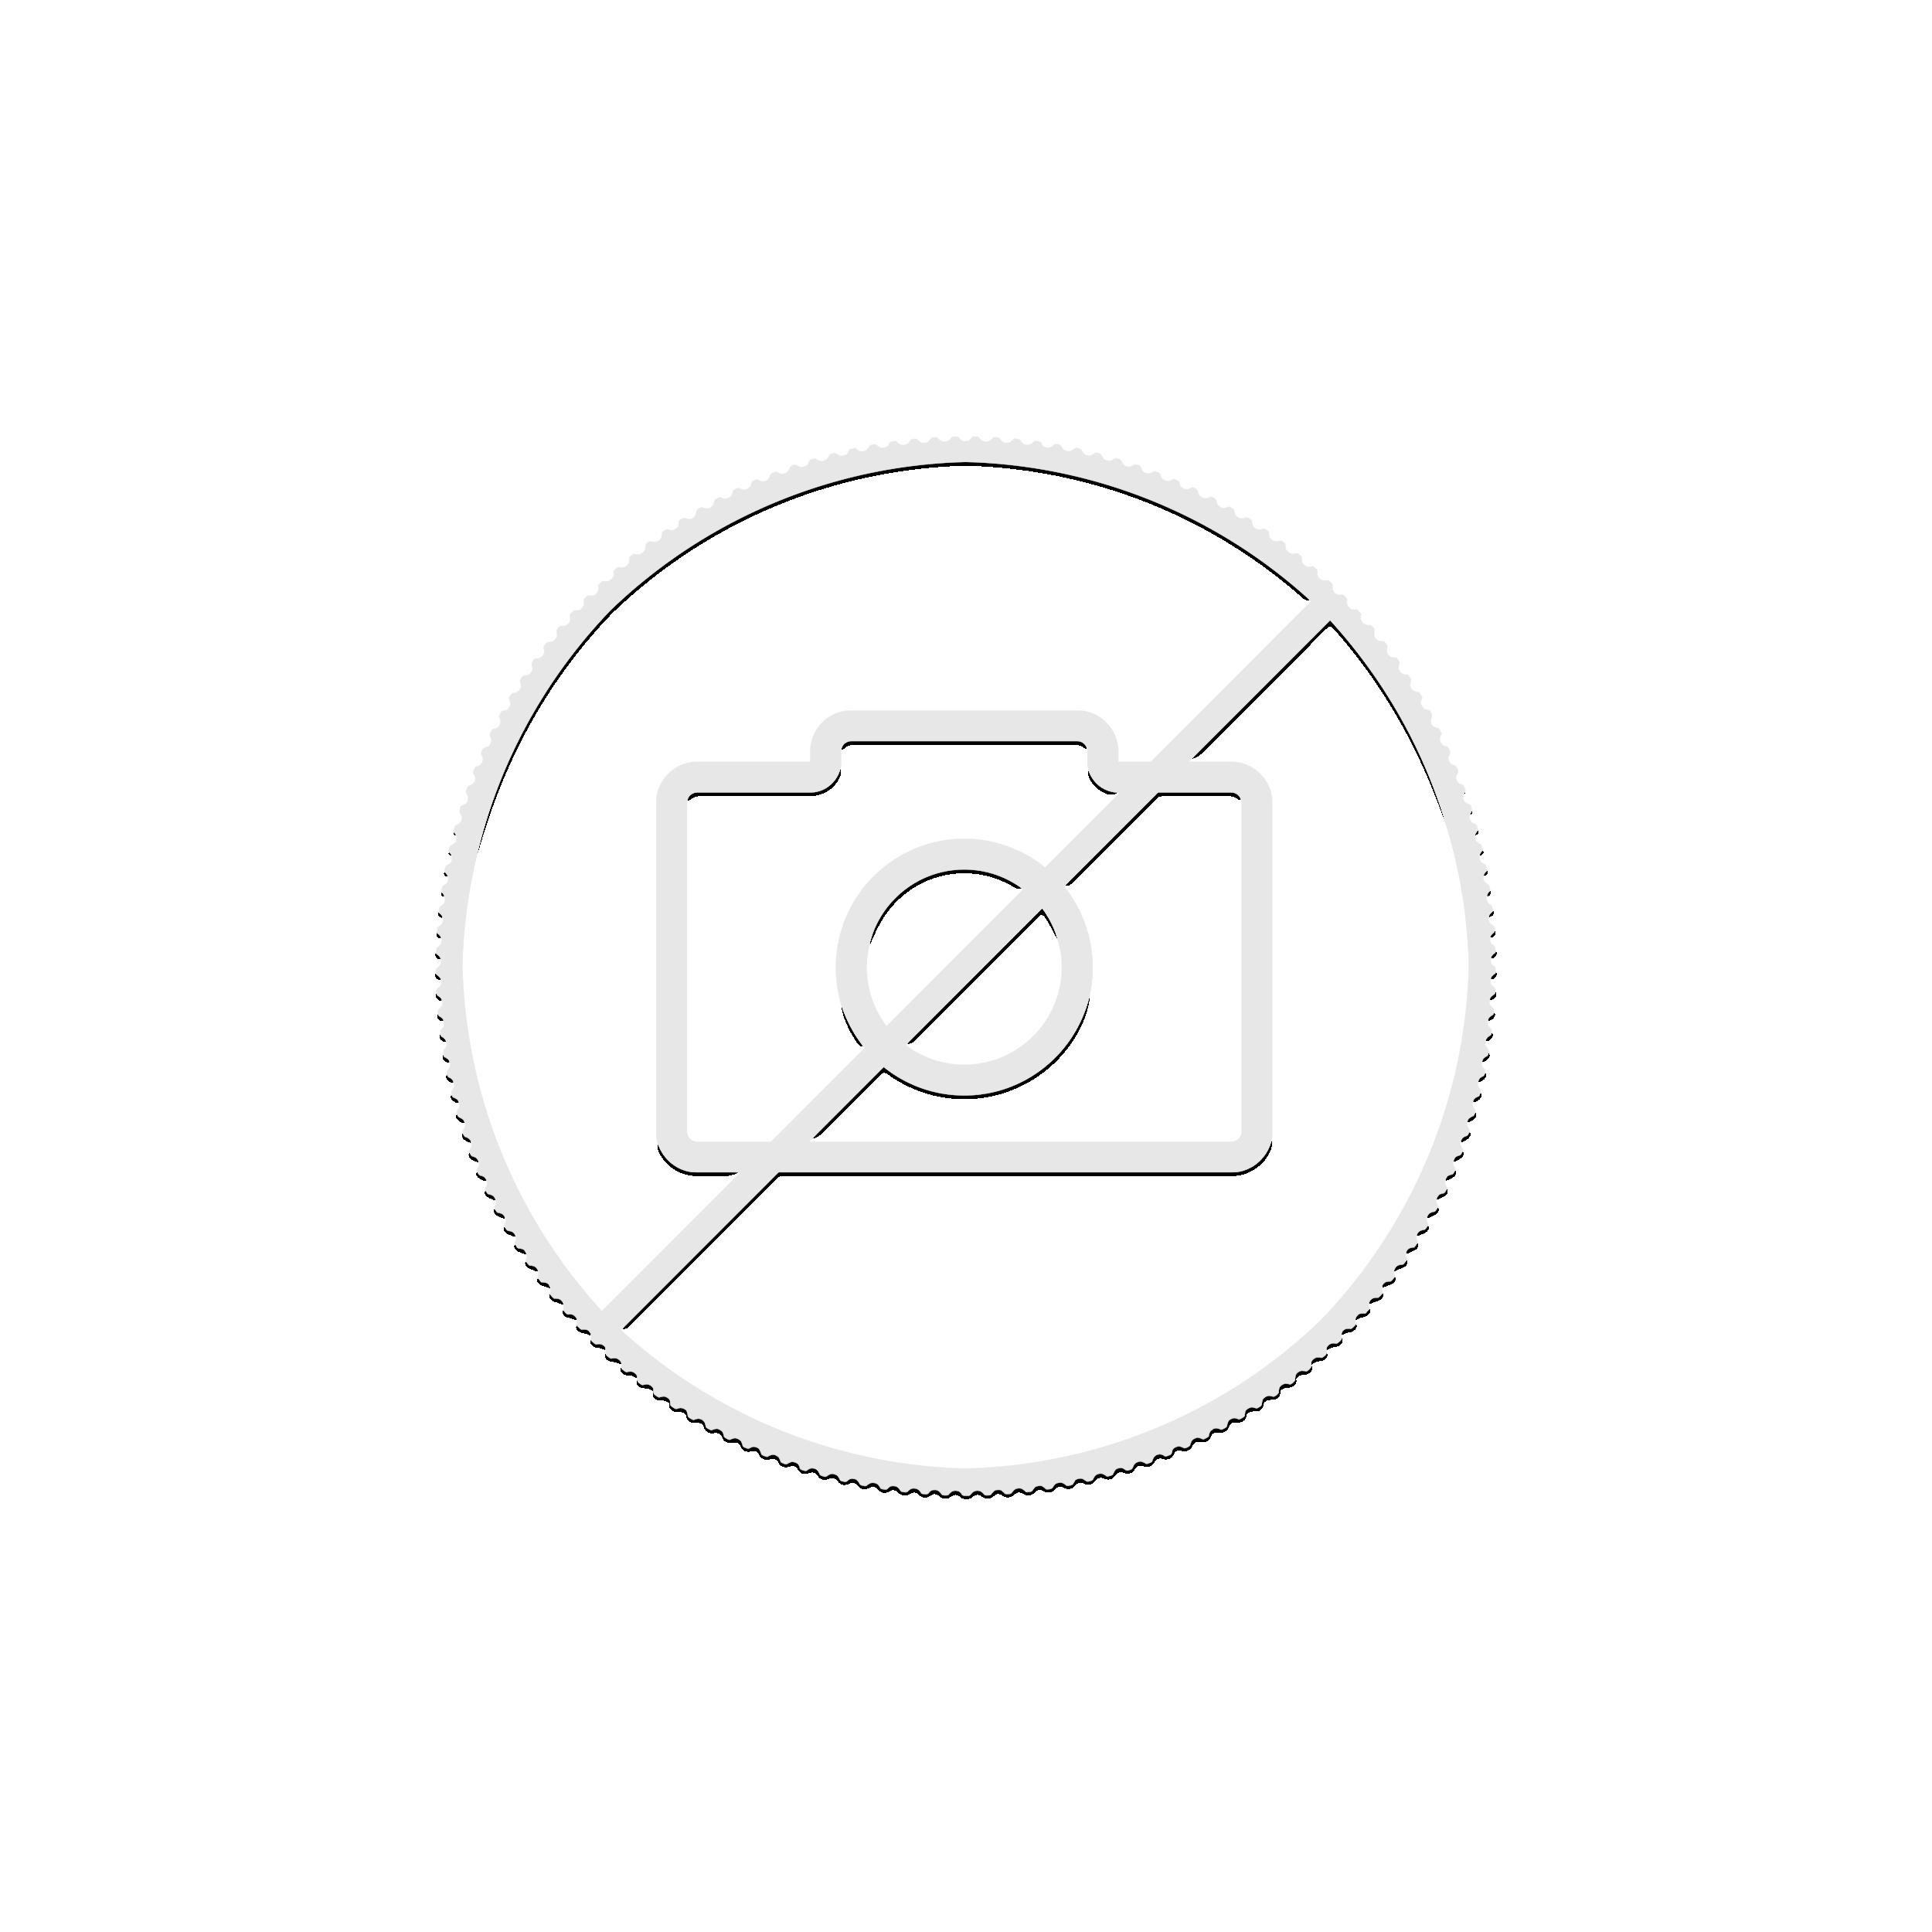 10 Troy ounce silver coin Maple Leaf 2018